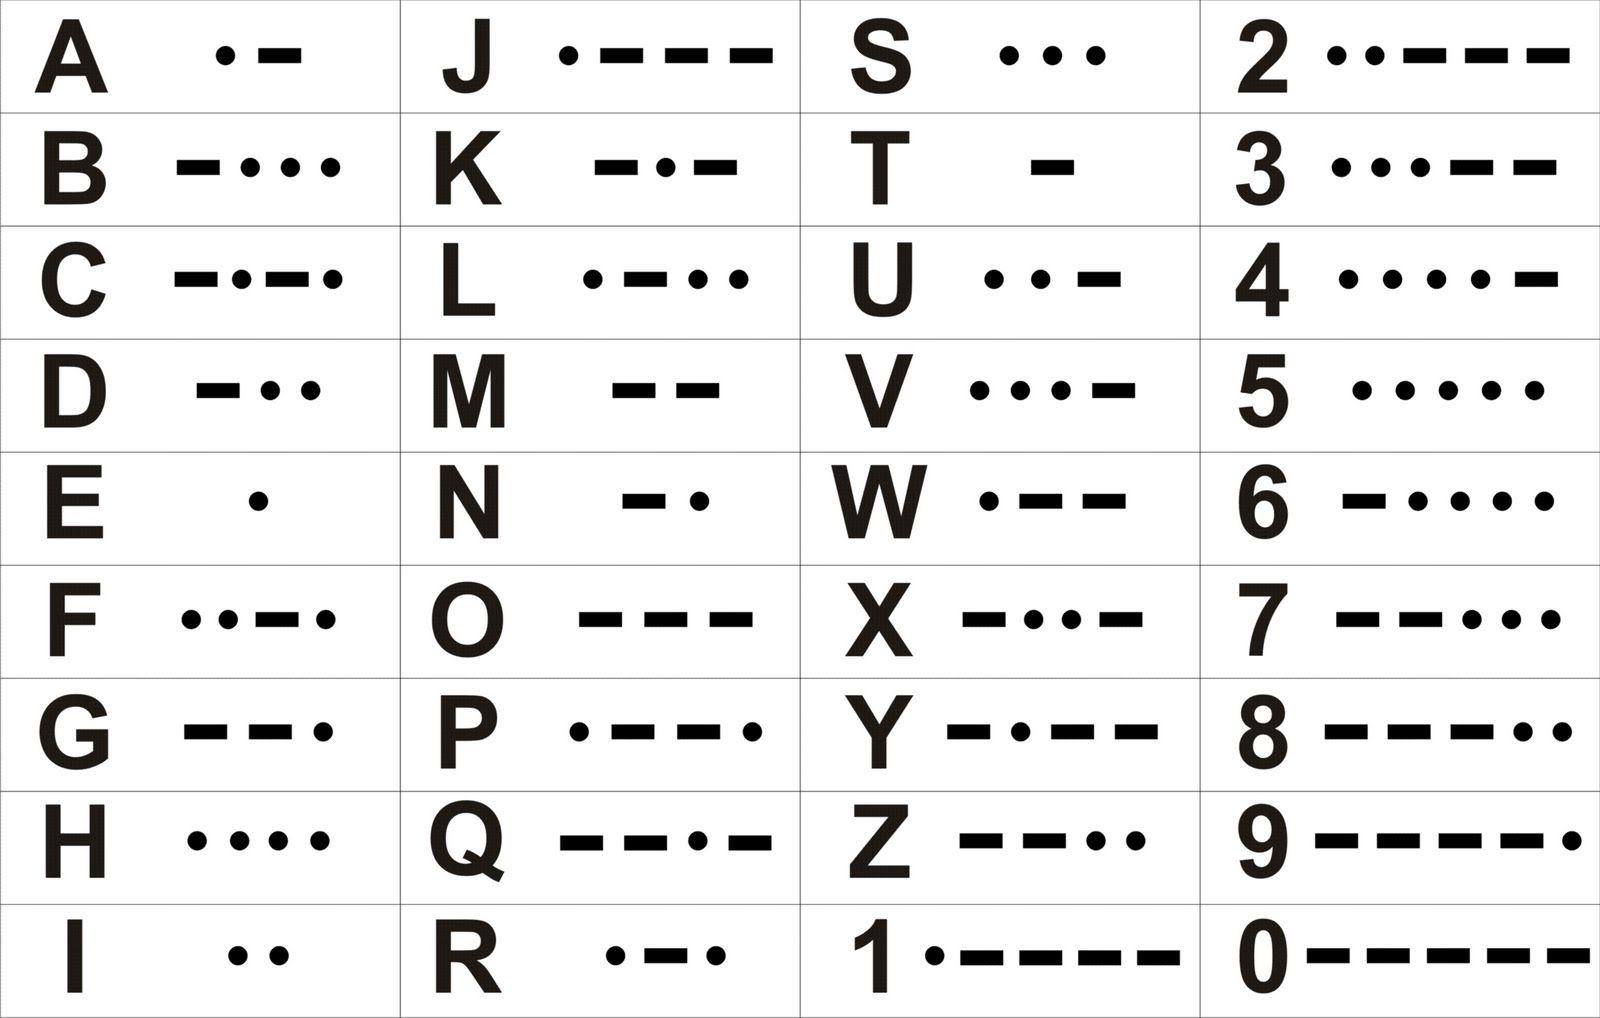 Hazlo Tú Mismo Pulseras Código Morse Steemit Alfabeto Morse Abecedario Morse Tatuaje Código Morse